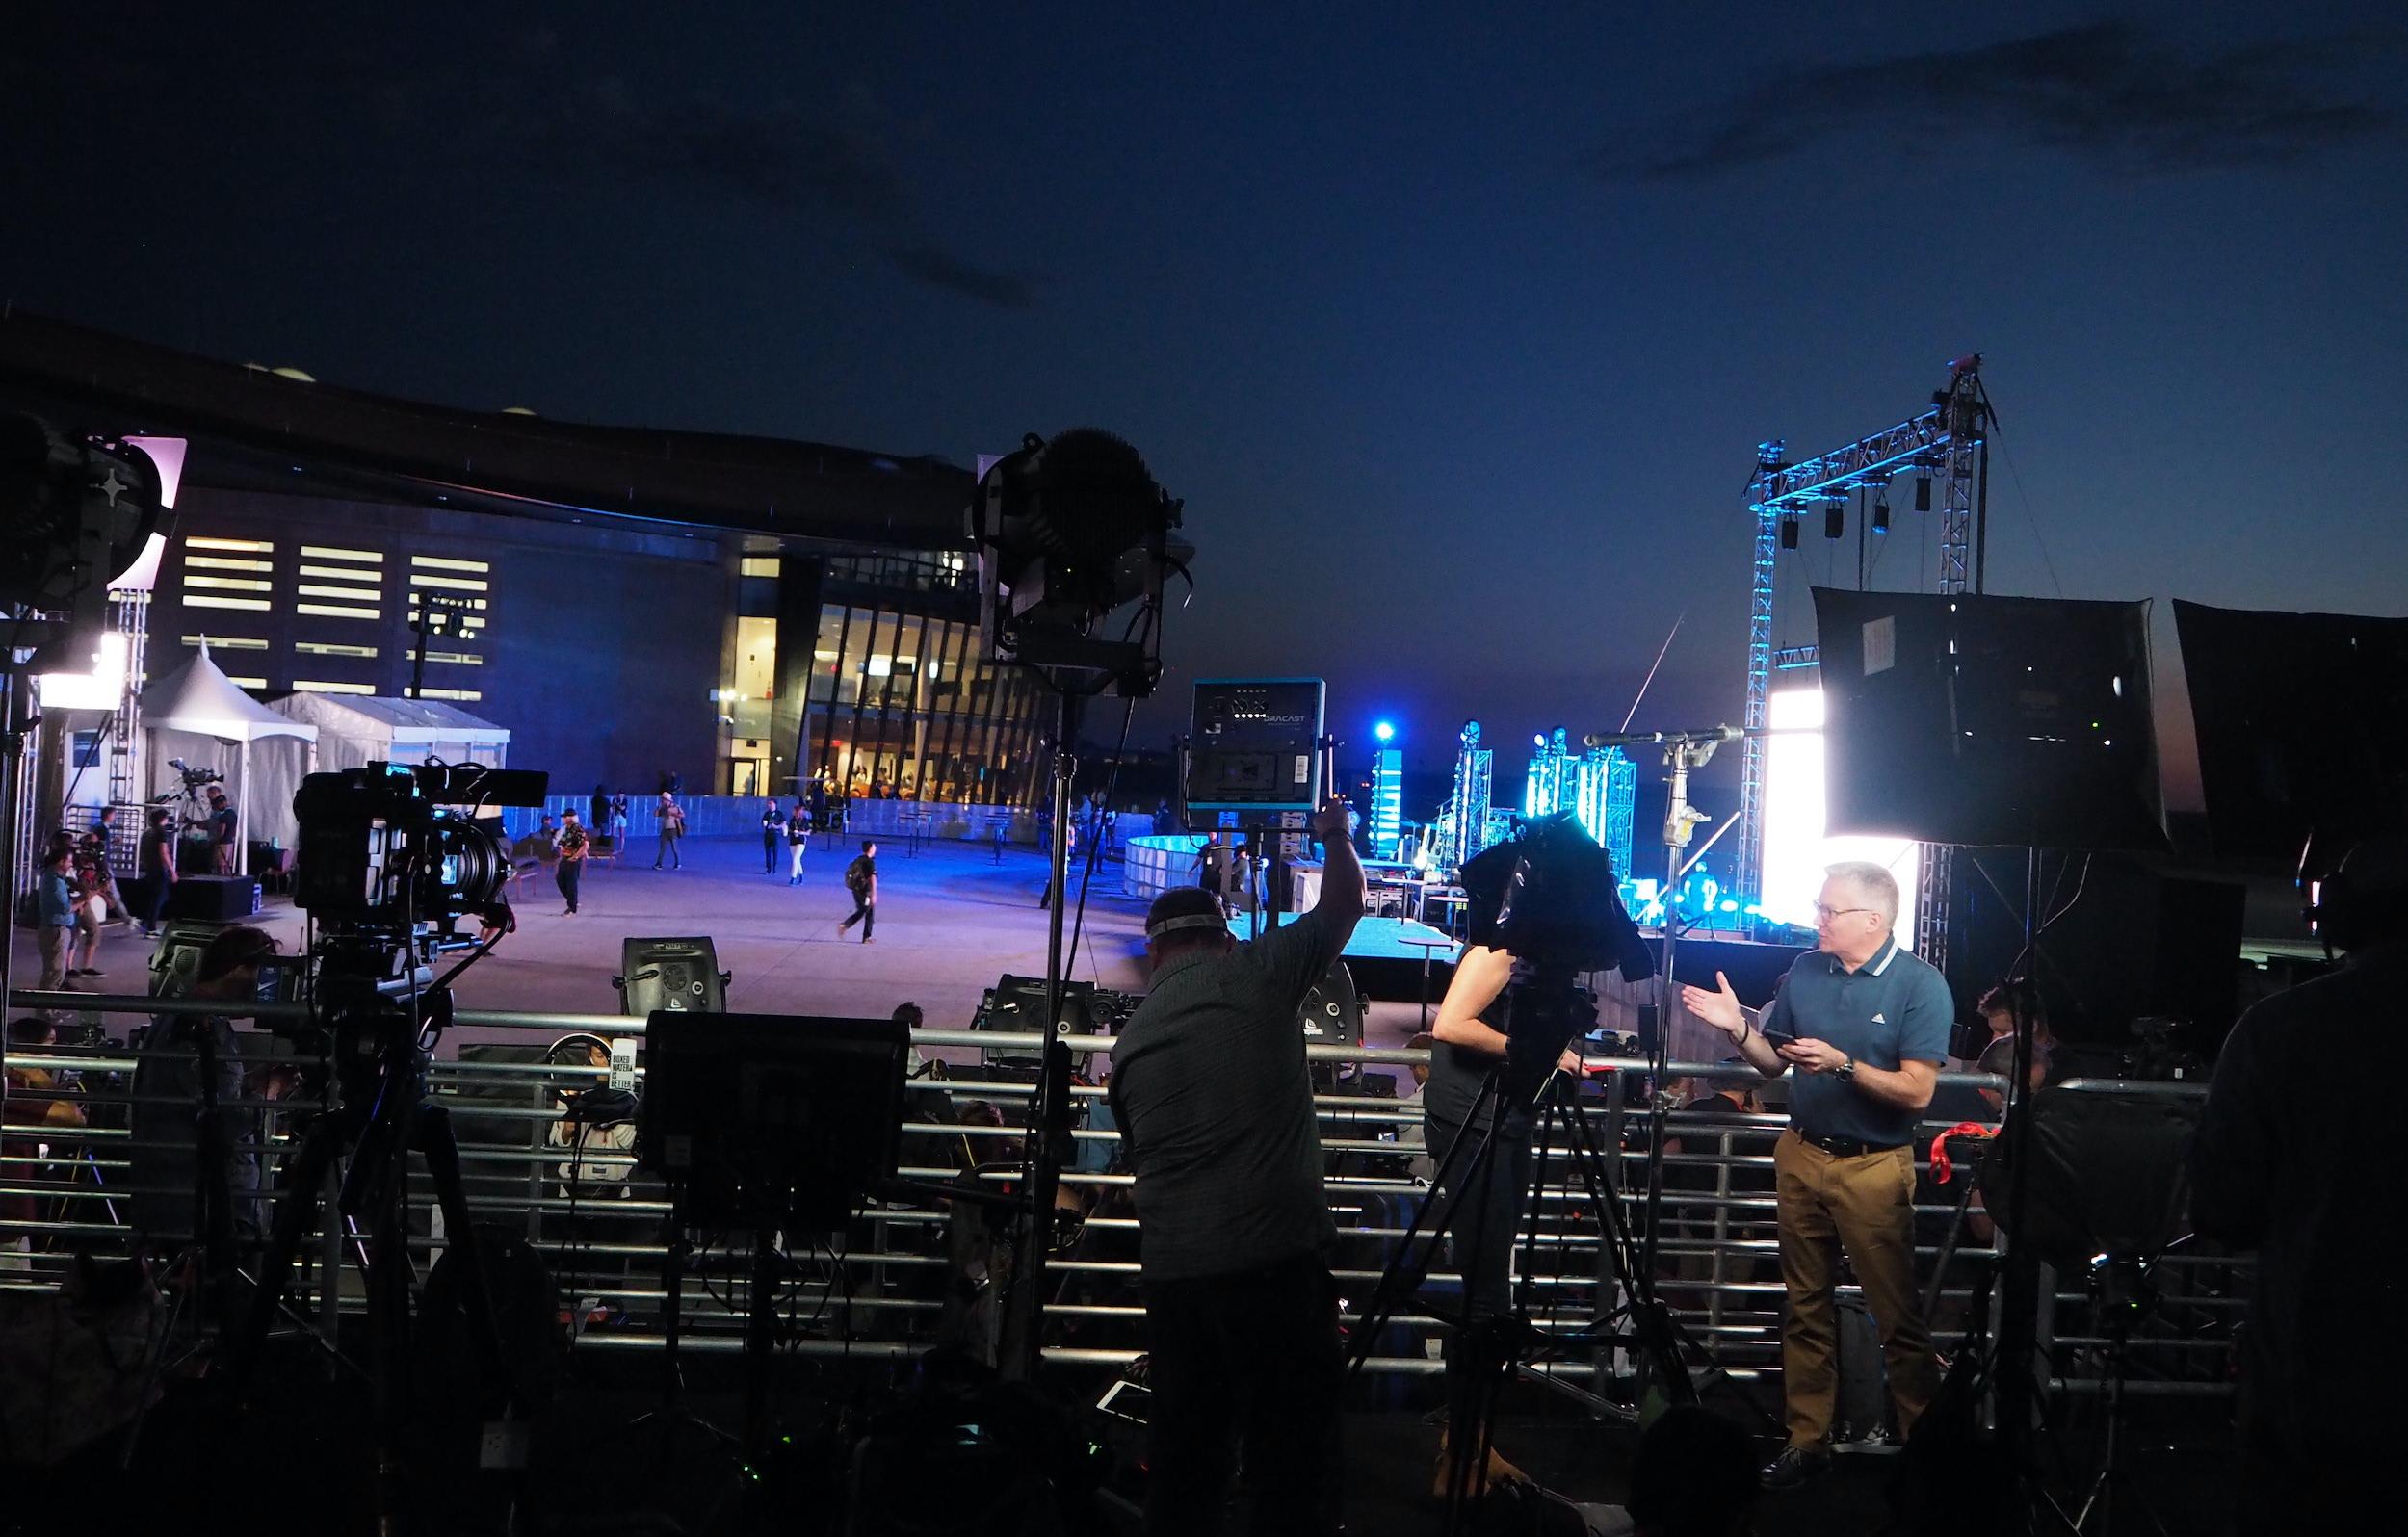 Press set up before dawn at Spaceport America.